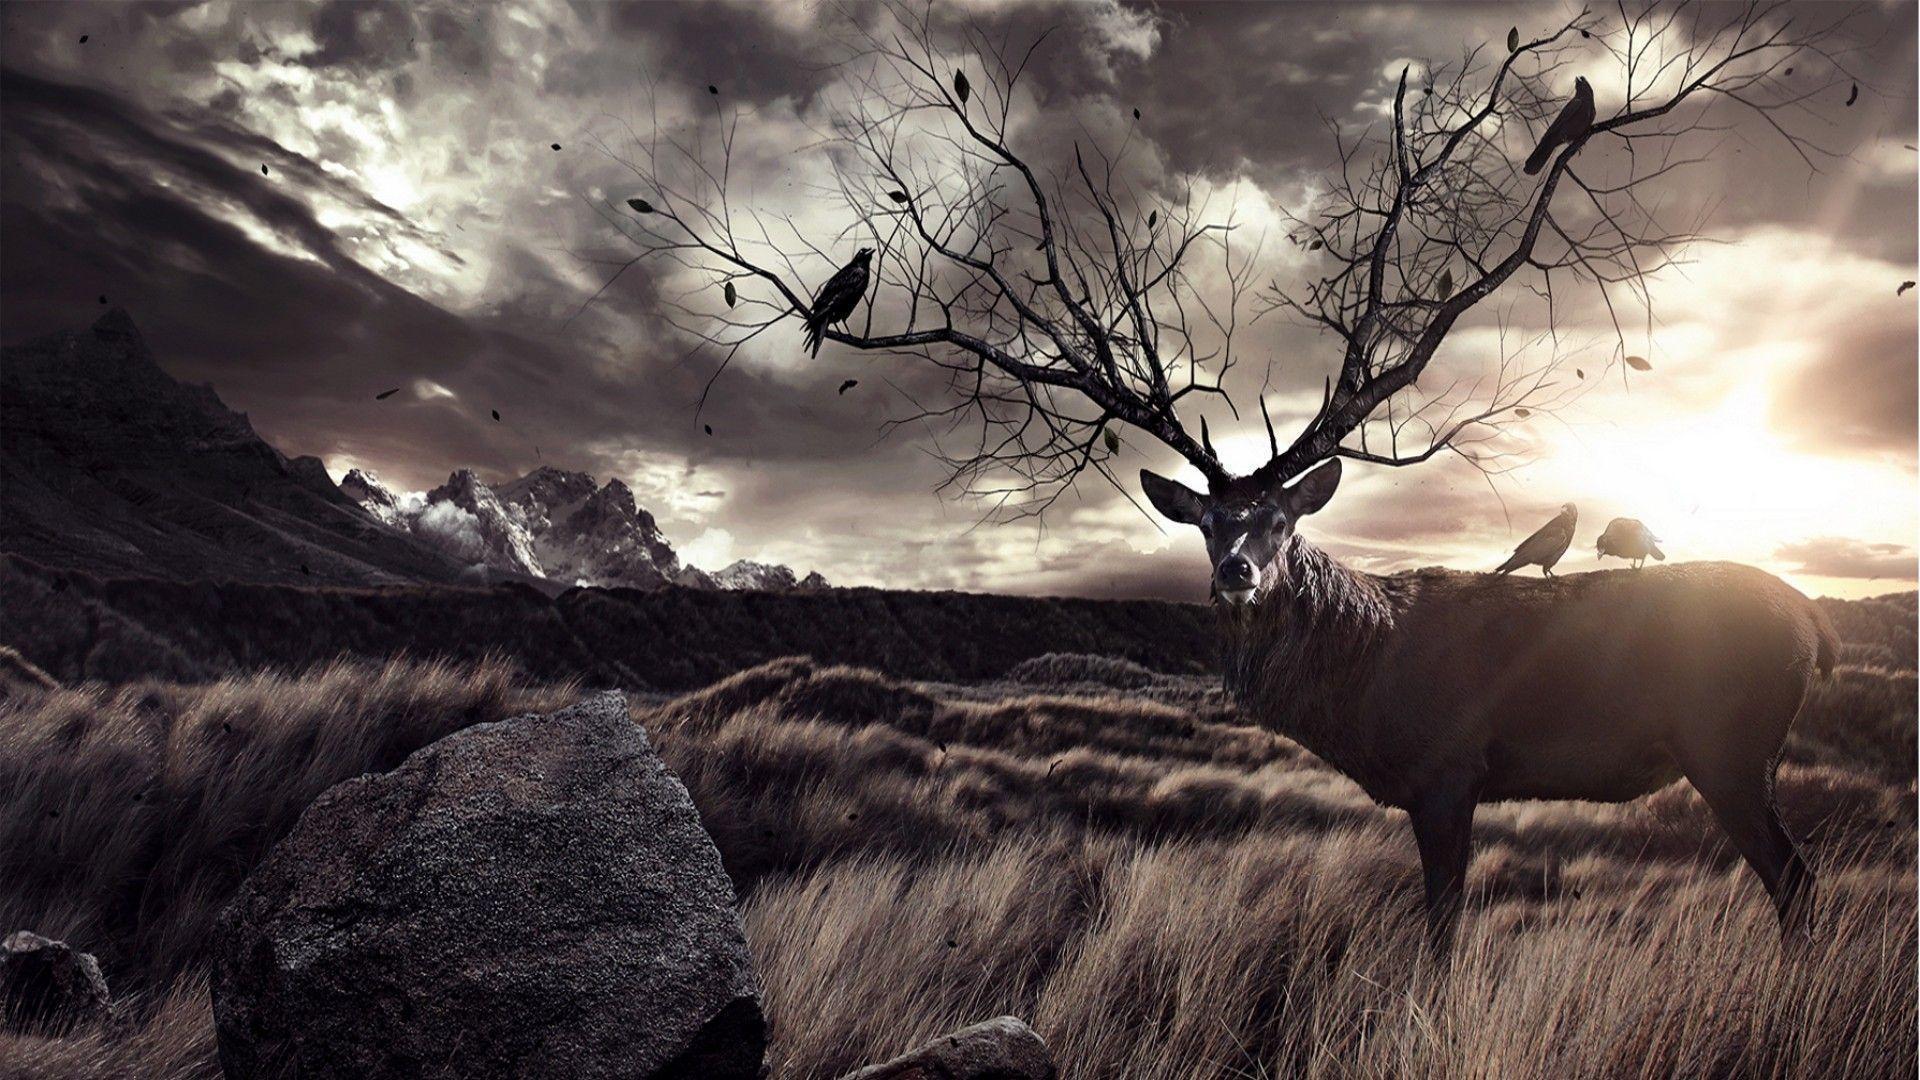 deer hunting wallpaper hd - photo #15